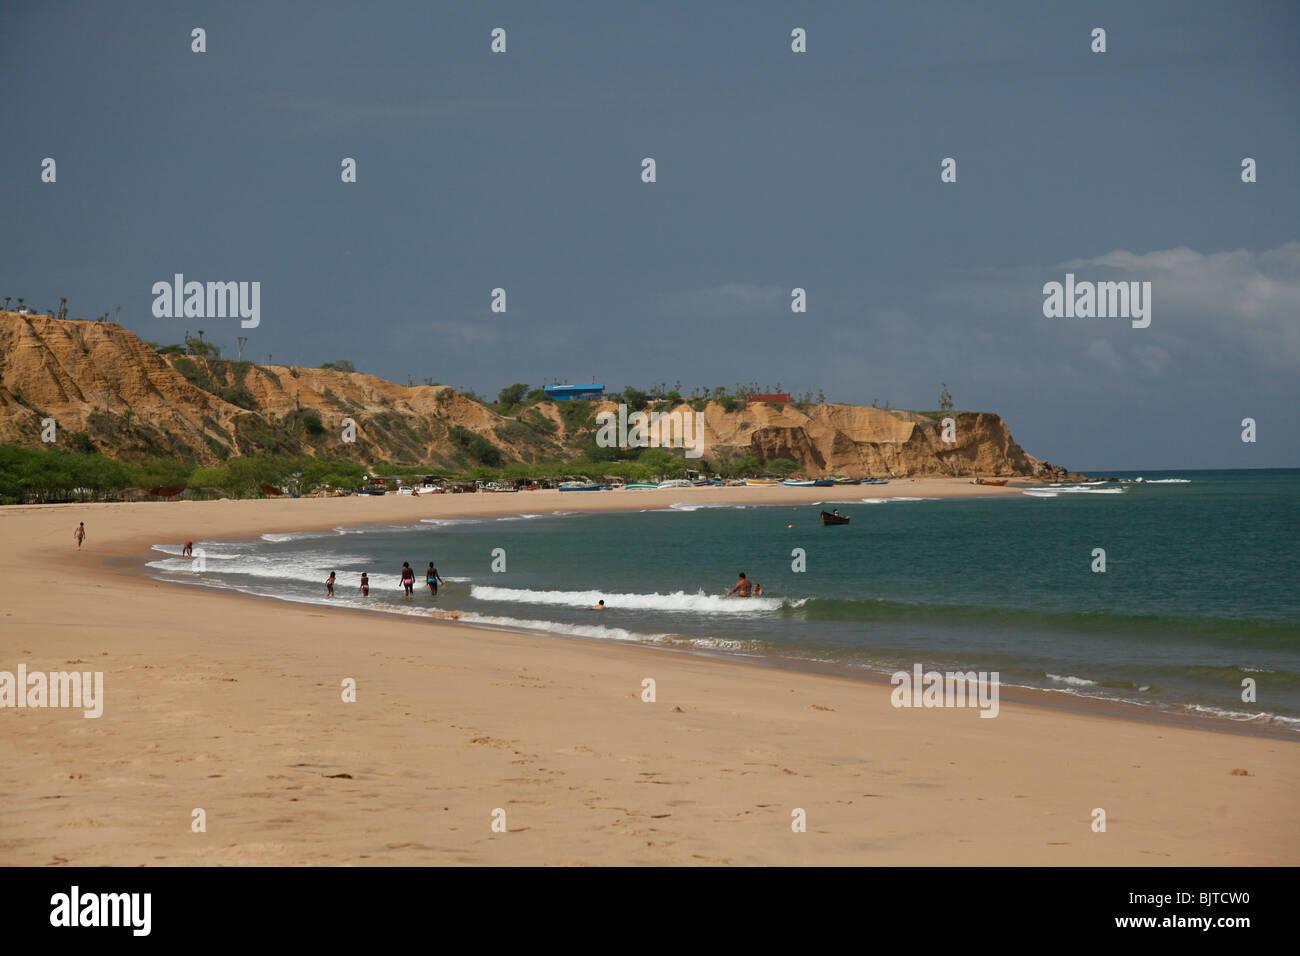 Sangano Beach, South of Luanda, Bengo province, Angola. Africa. © Zute Lightfoot www.lightfootphoto.com - Stock Image